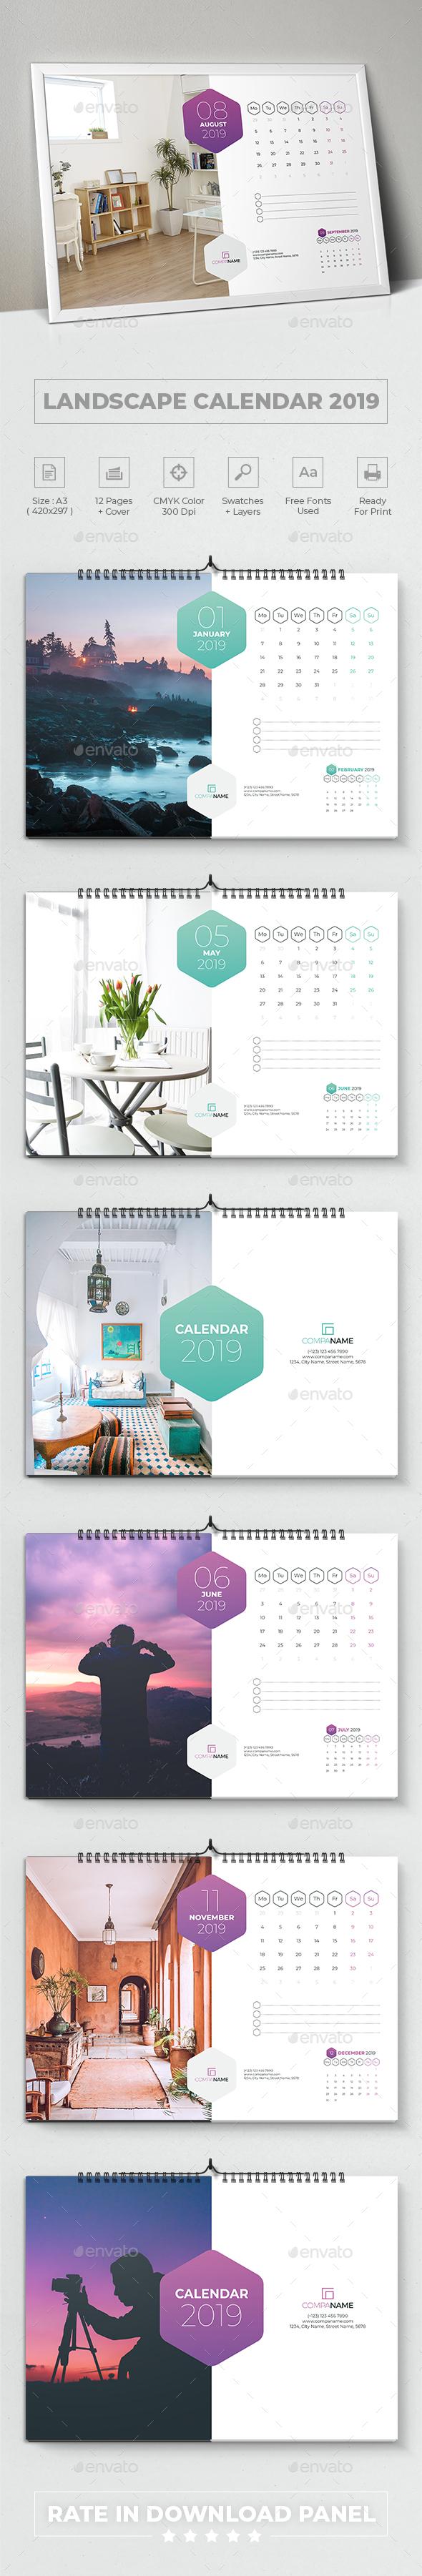 Landscape Calendar 2019 - Calendars Stationery